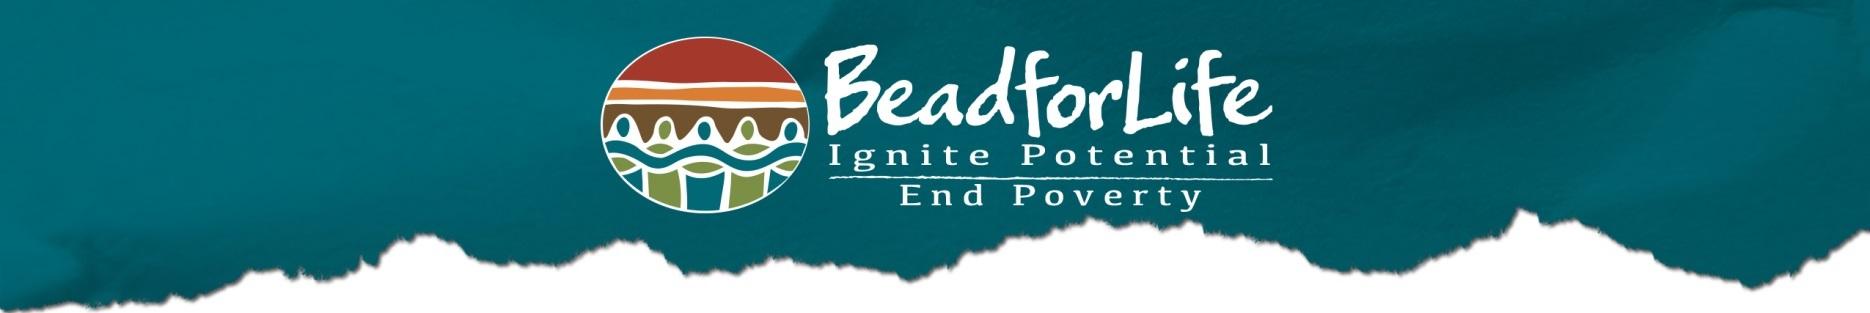 Beadforlife Header